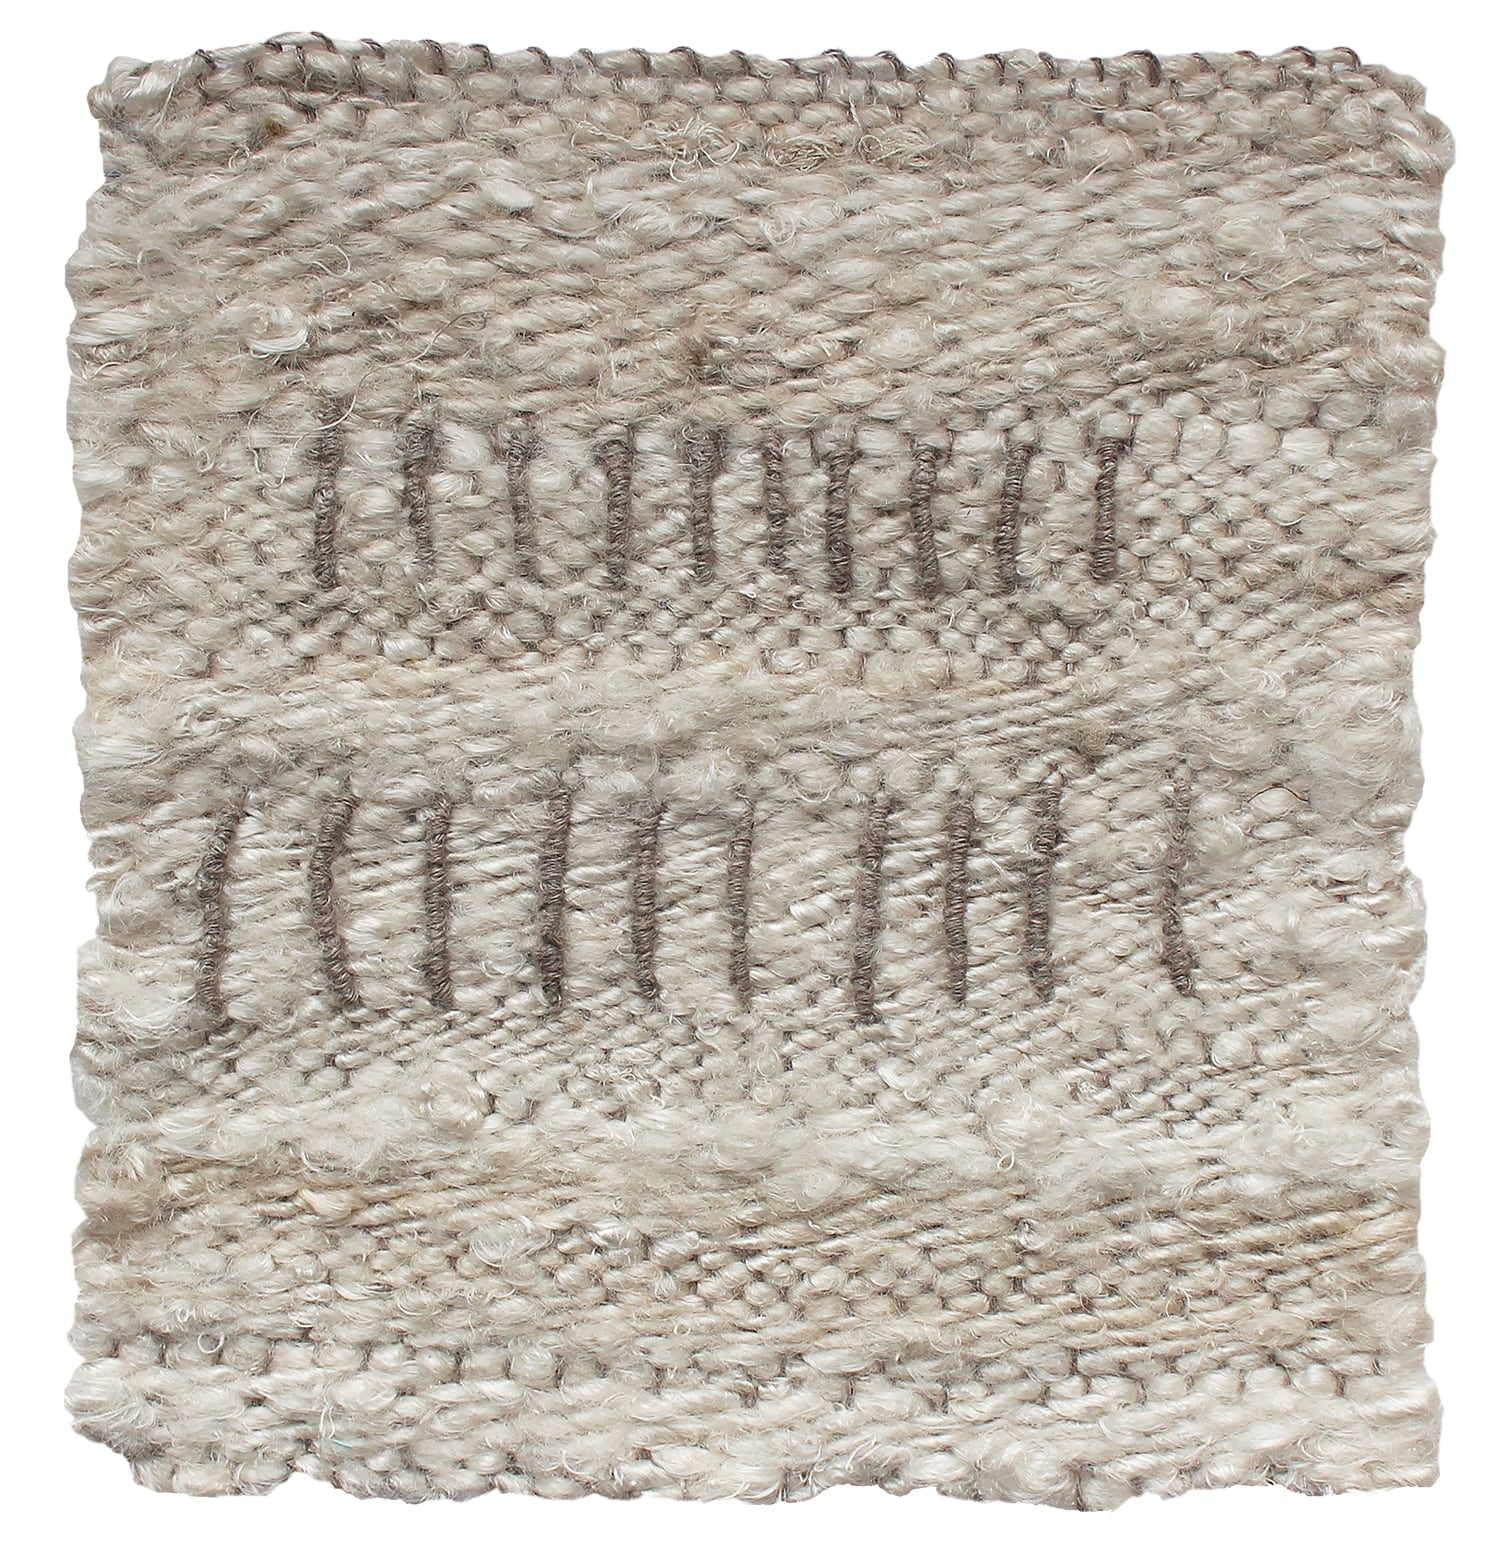 20-wrapped-lines-grey-silk-wool-min.jpg